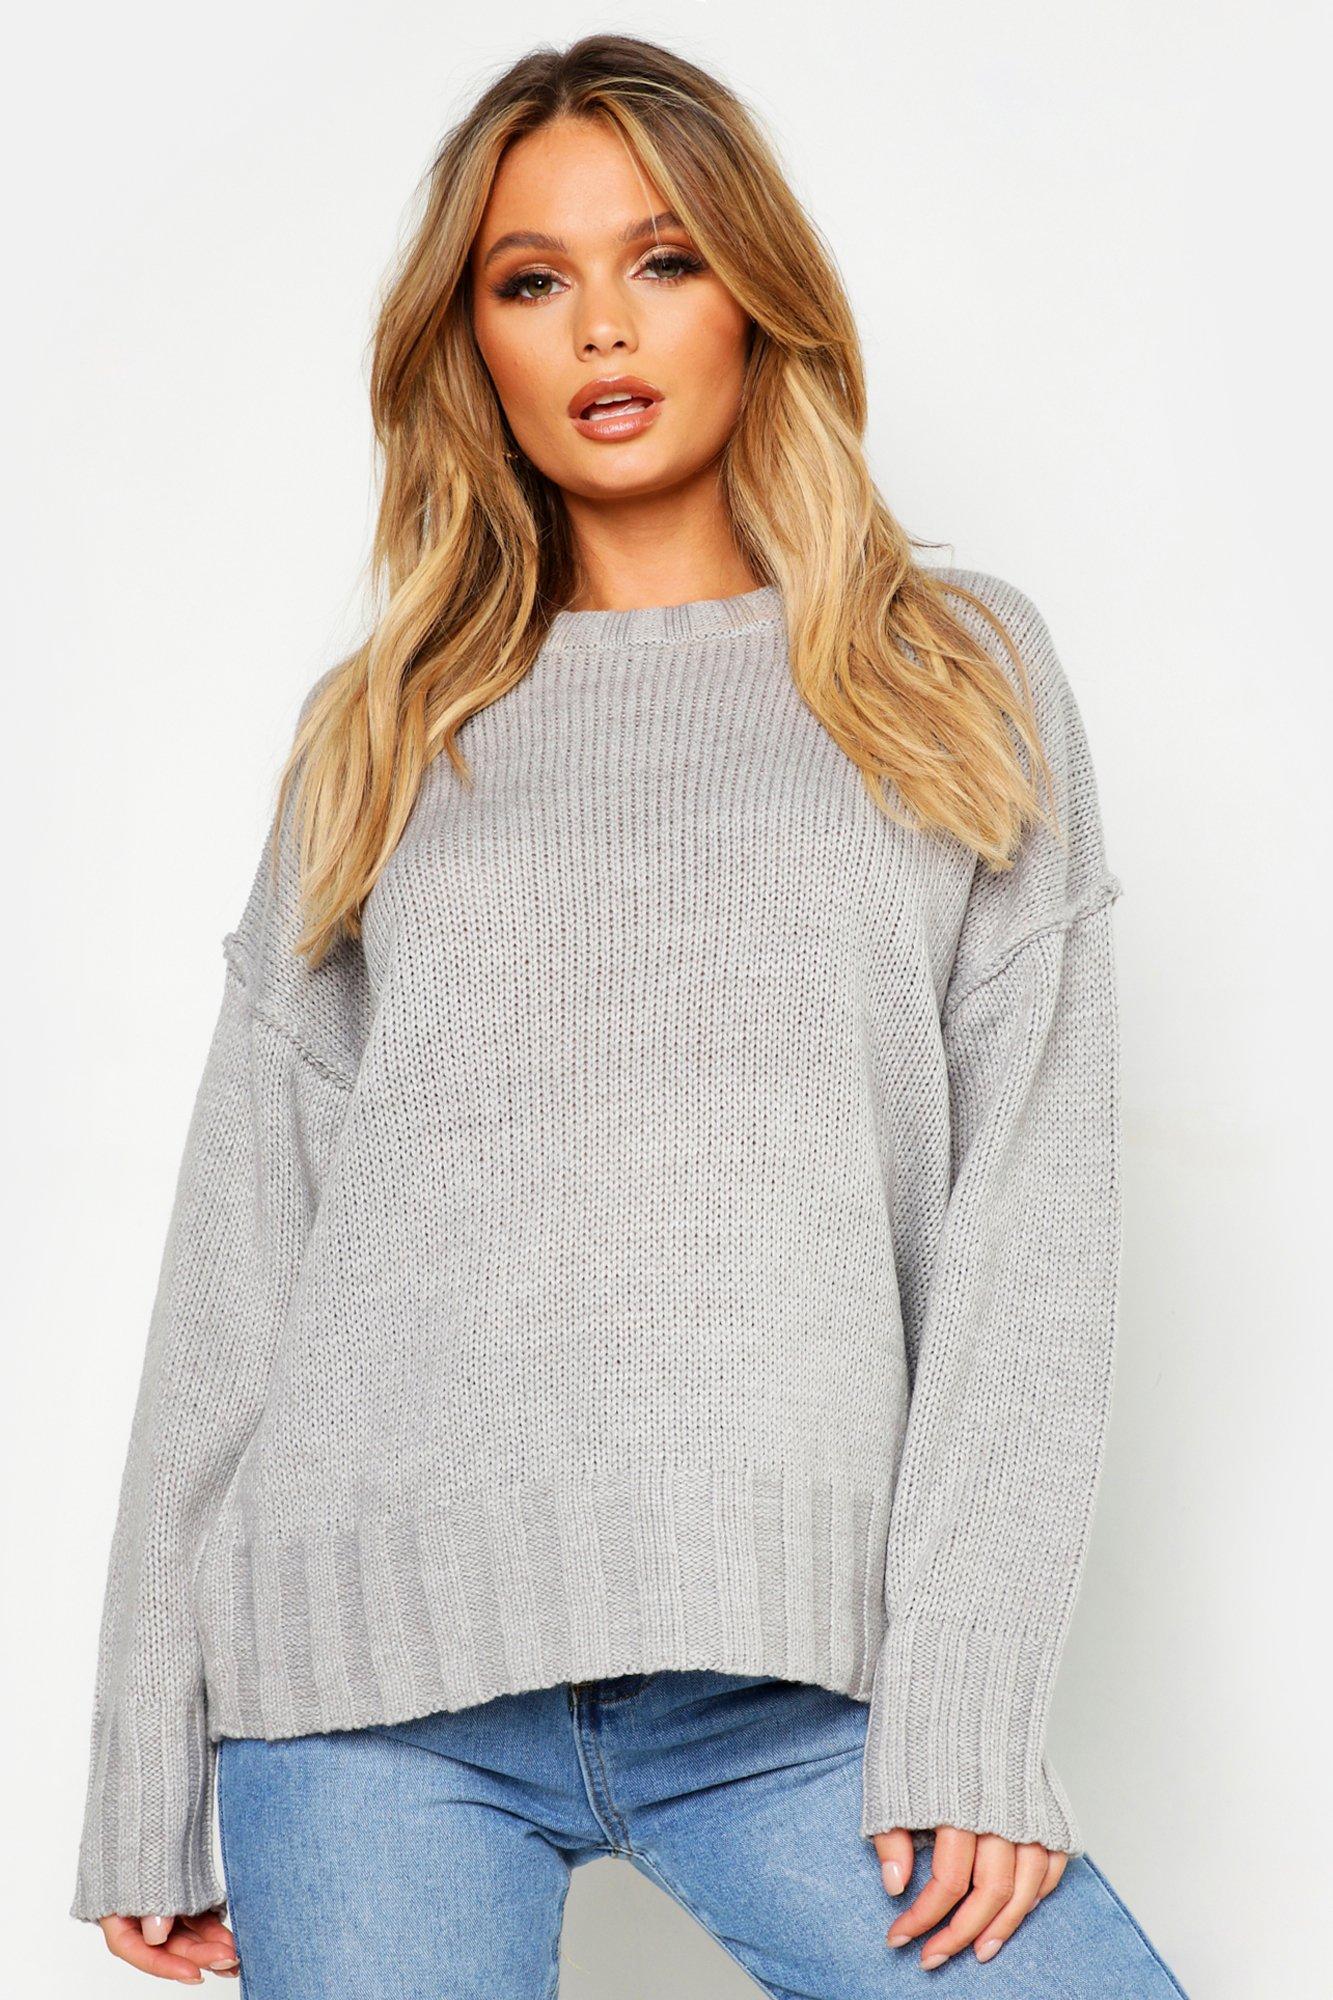 Womens Oversized-Pullover - grau - M, Grau - Boohoo.com